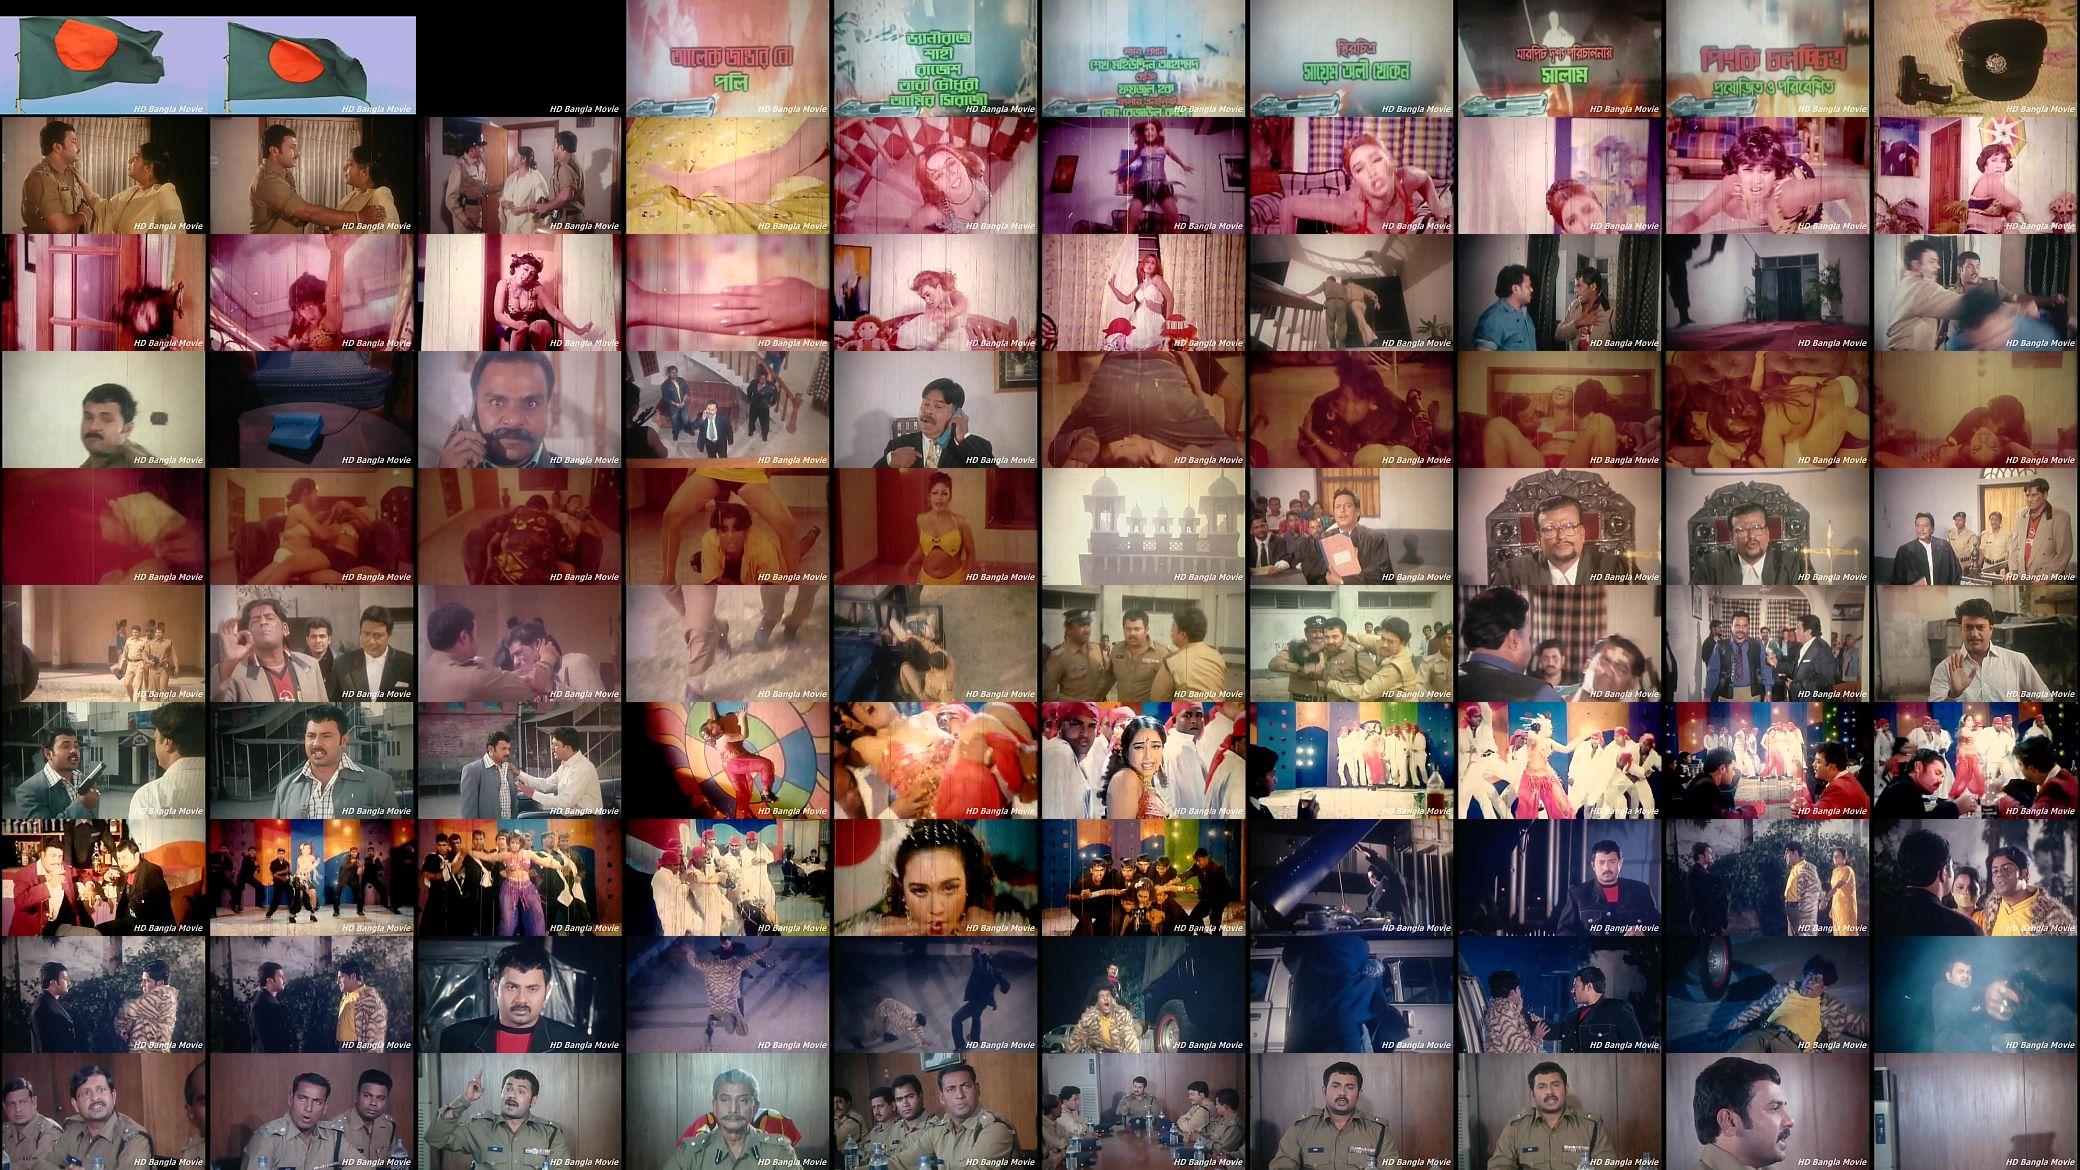 encounter bangla full movie 720p part 01 - youtube - xnxx